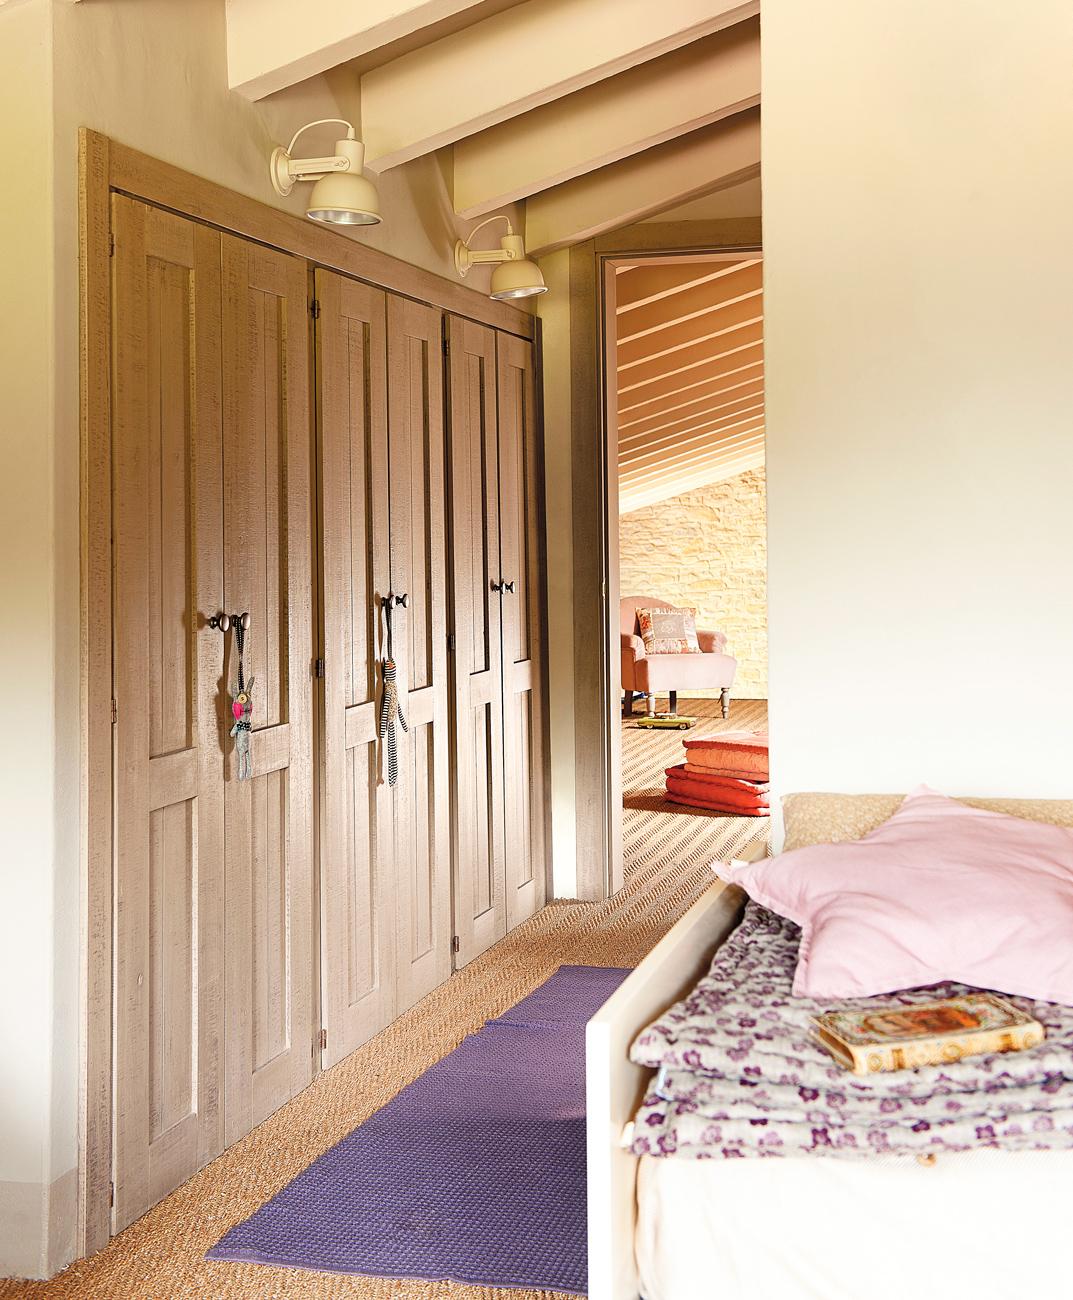 Como revestir un armario free forrar armarios homemaker - Revestir armario empotrado ...